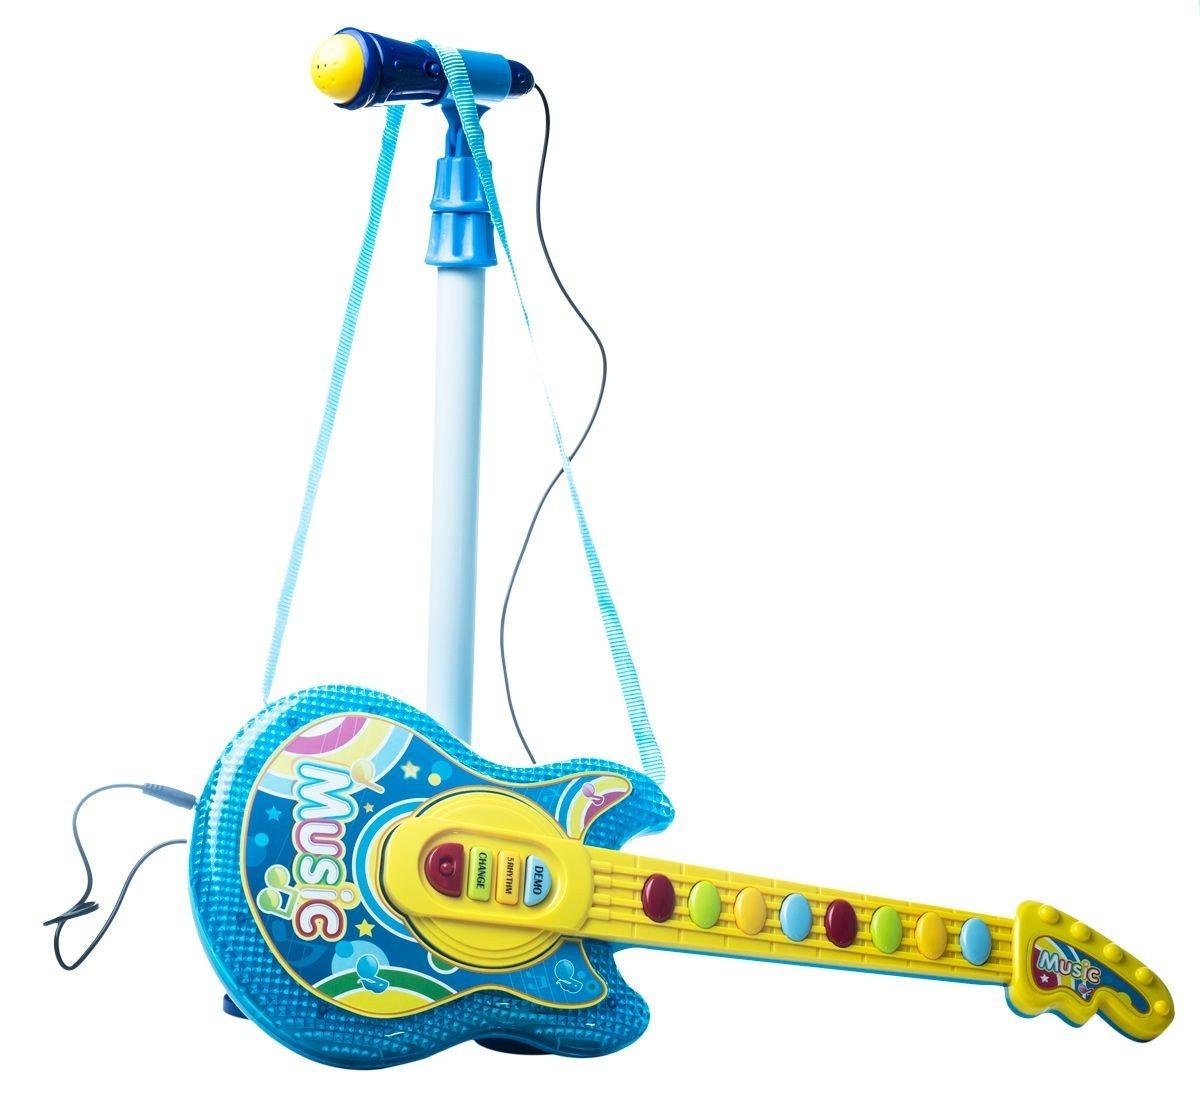 Pk Electrica Niñas Regalos Juguetes Guitarra 6012c Niños Kit q54ARL3j